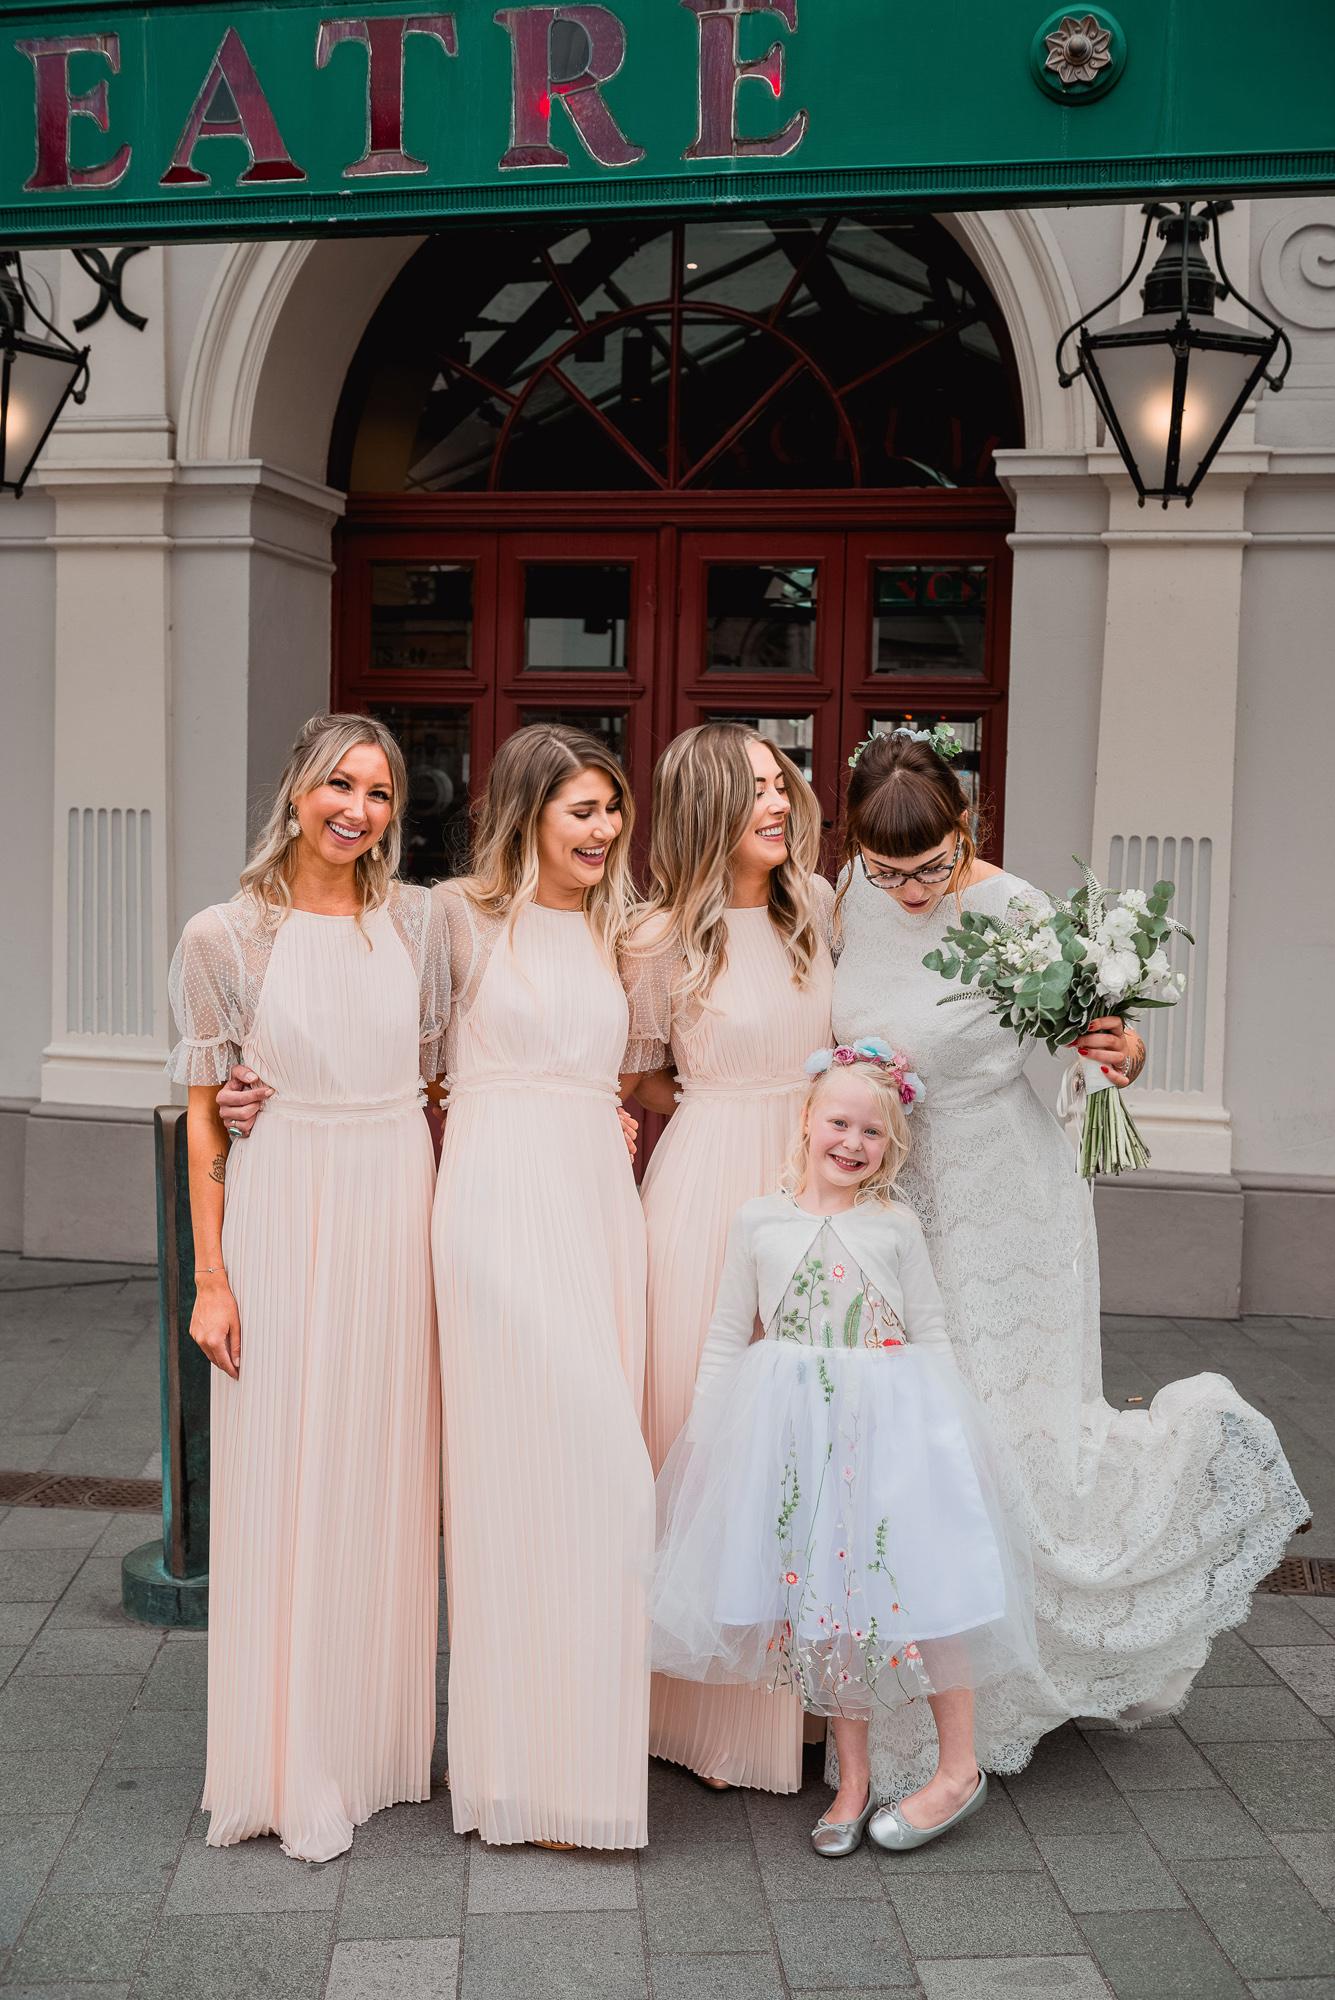 Harriet-Dahlia-Bespoke-Lace-Silk-Bohemian-Wedding-Dress-Sleeves-Tattooed-Bride-Alternative-Wedding-Sheffield-17.jpg